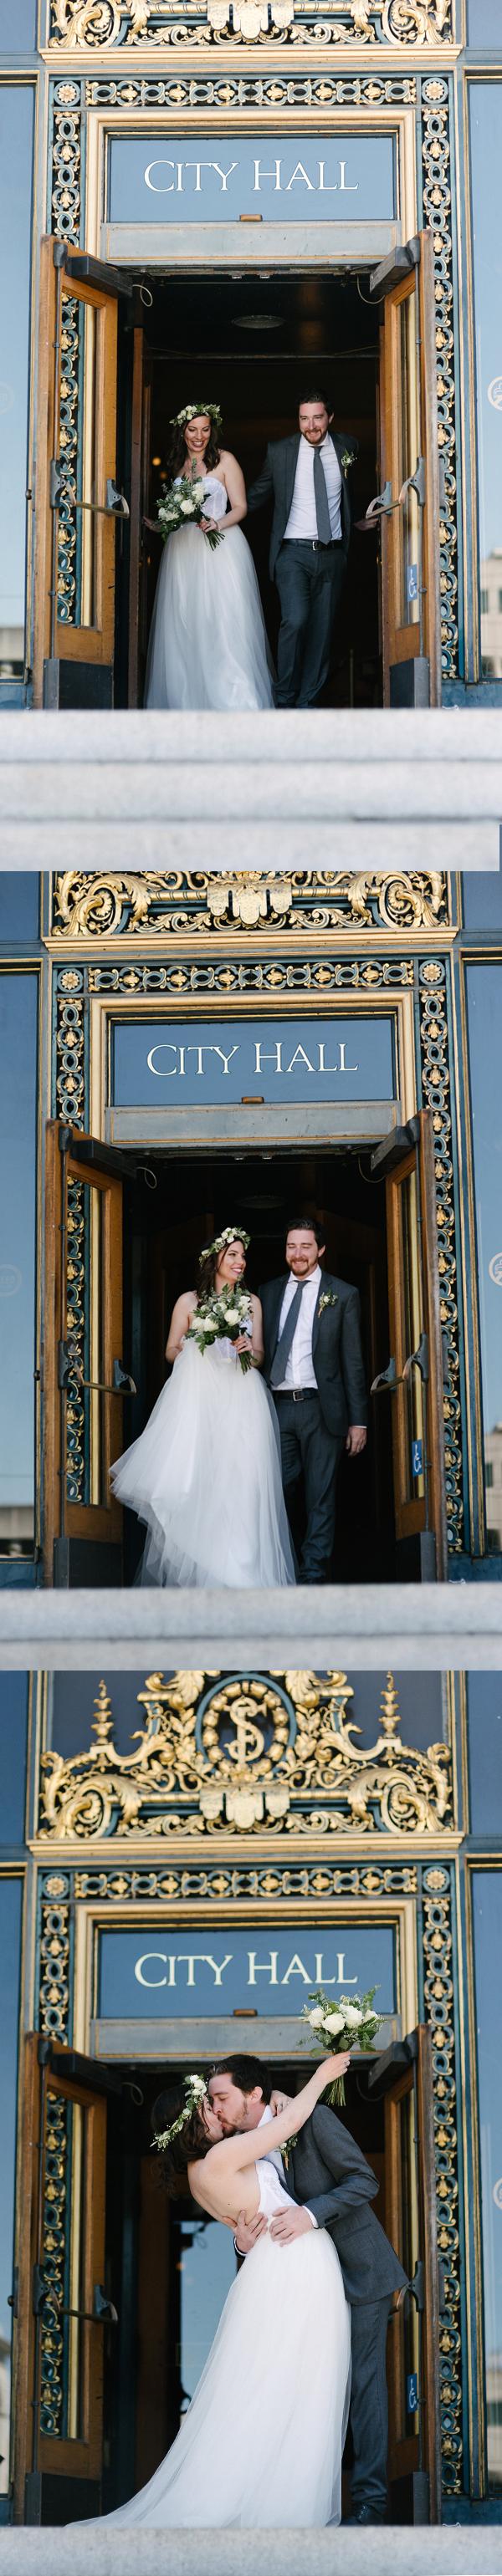 A zero waste wedding at San Francisco City Hall read more at www.goingzerowaste.com